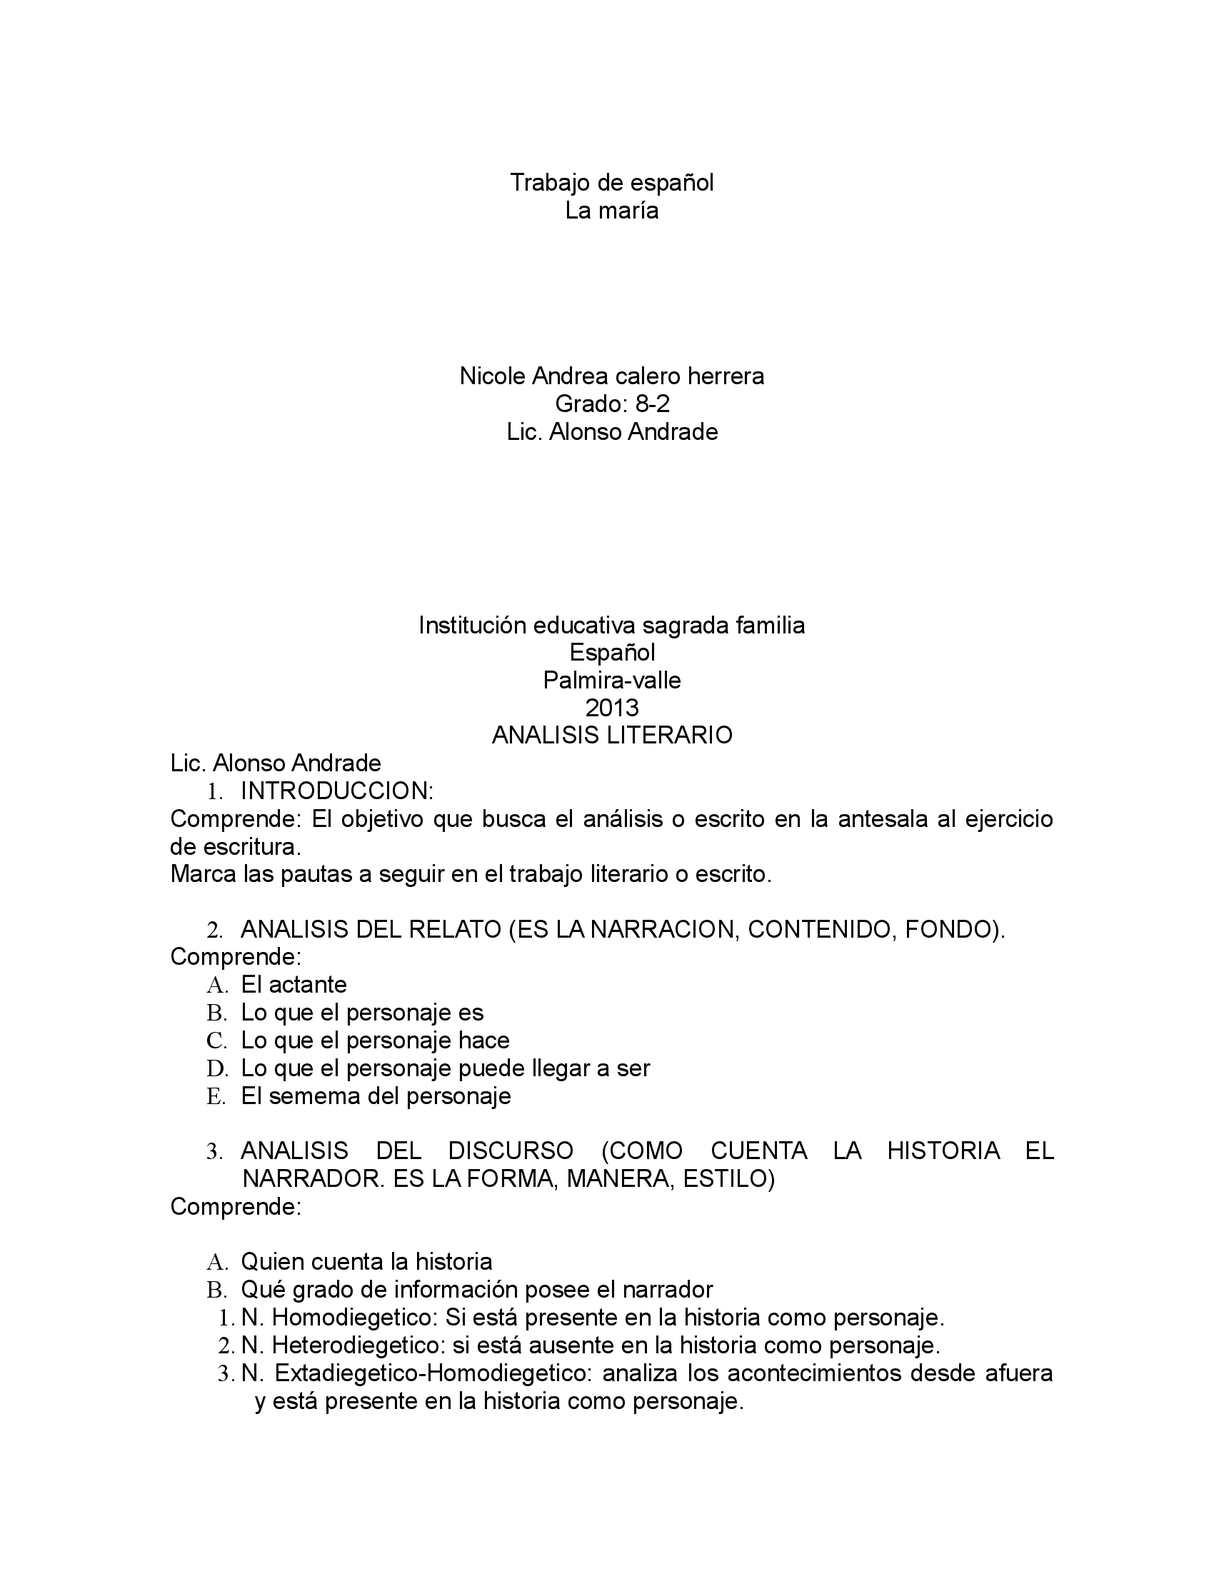 Calaméo - Análisis literario Libro La Maria